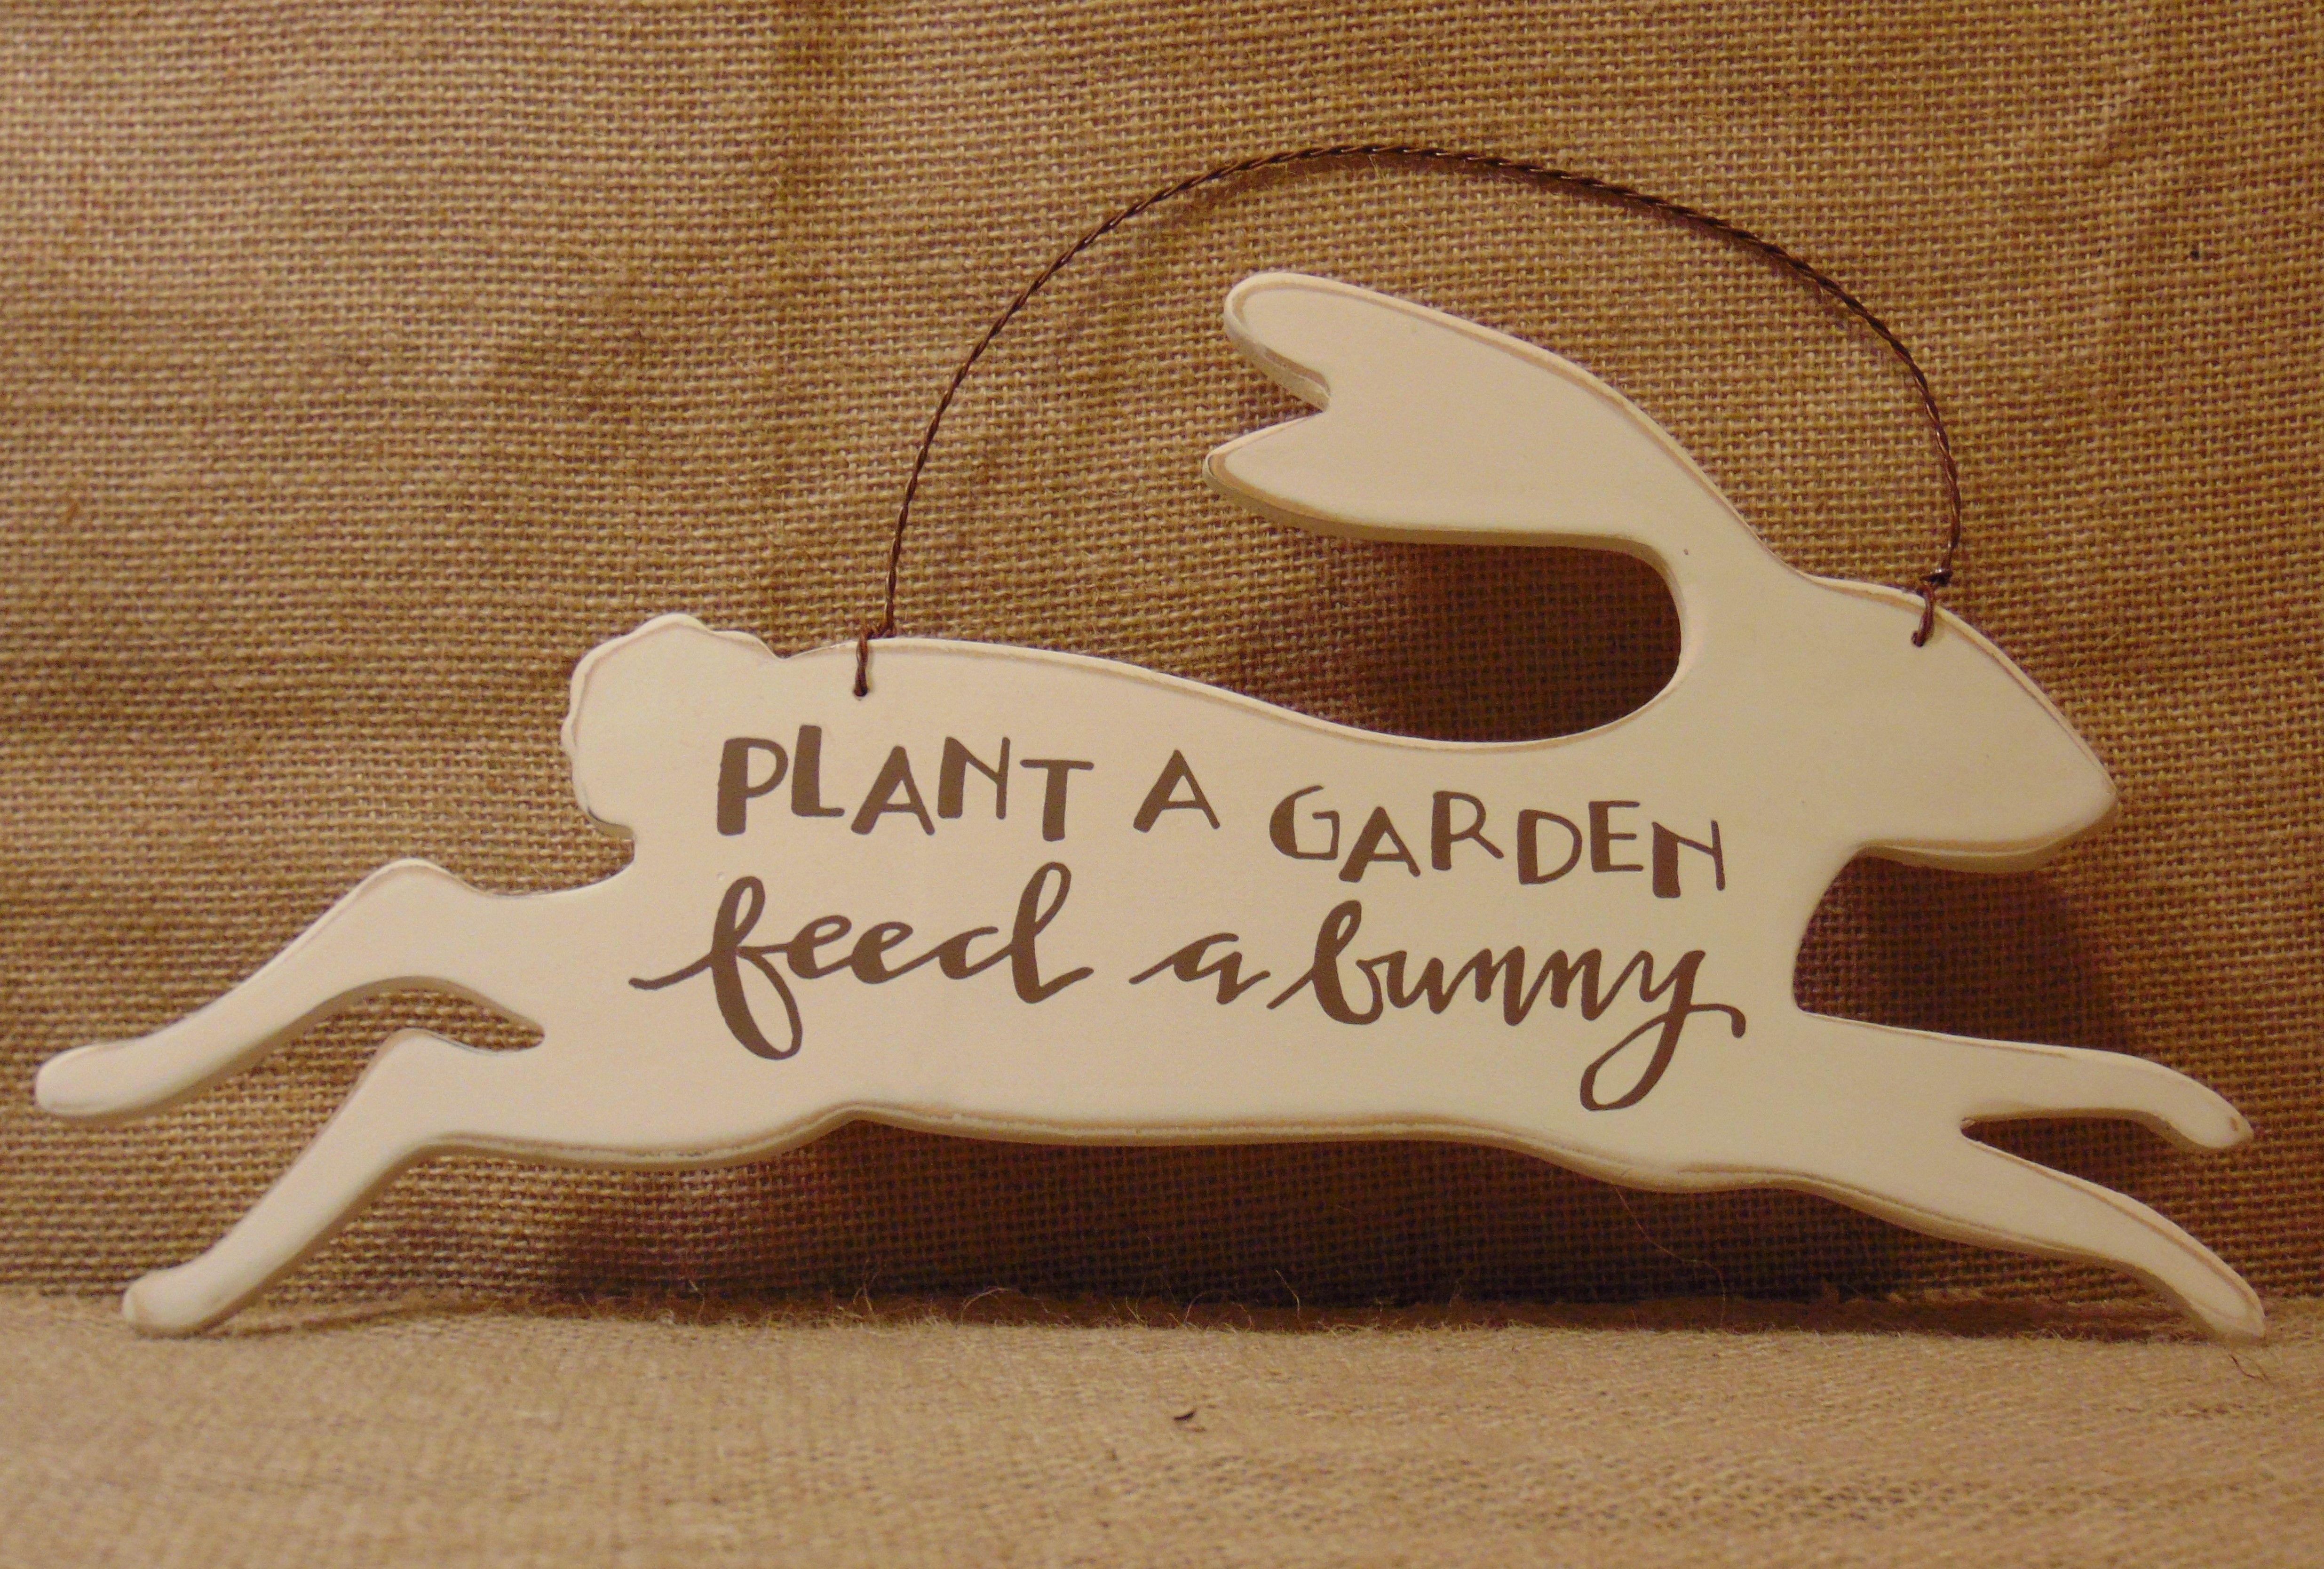 Garden Sign Feed a Bunny #874 | Bunny, Plants and Gardens